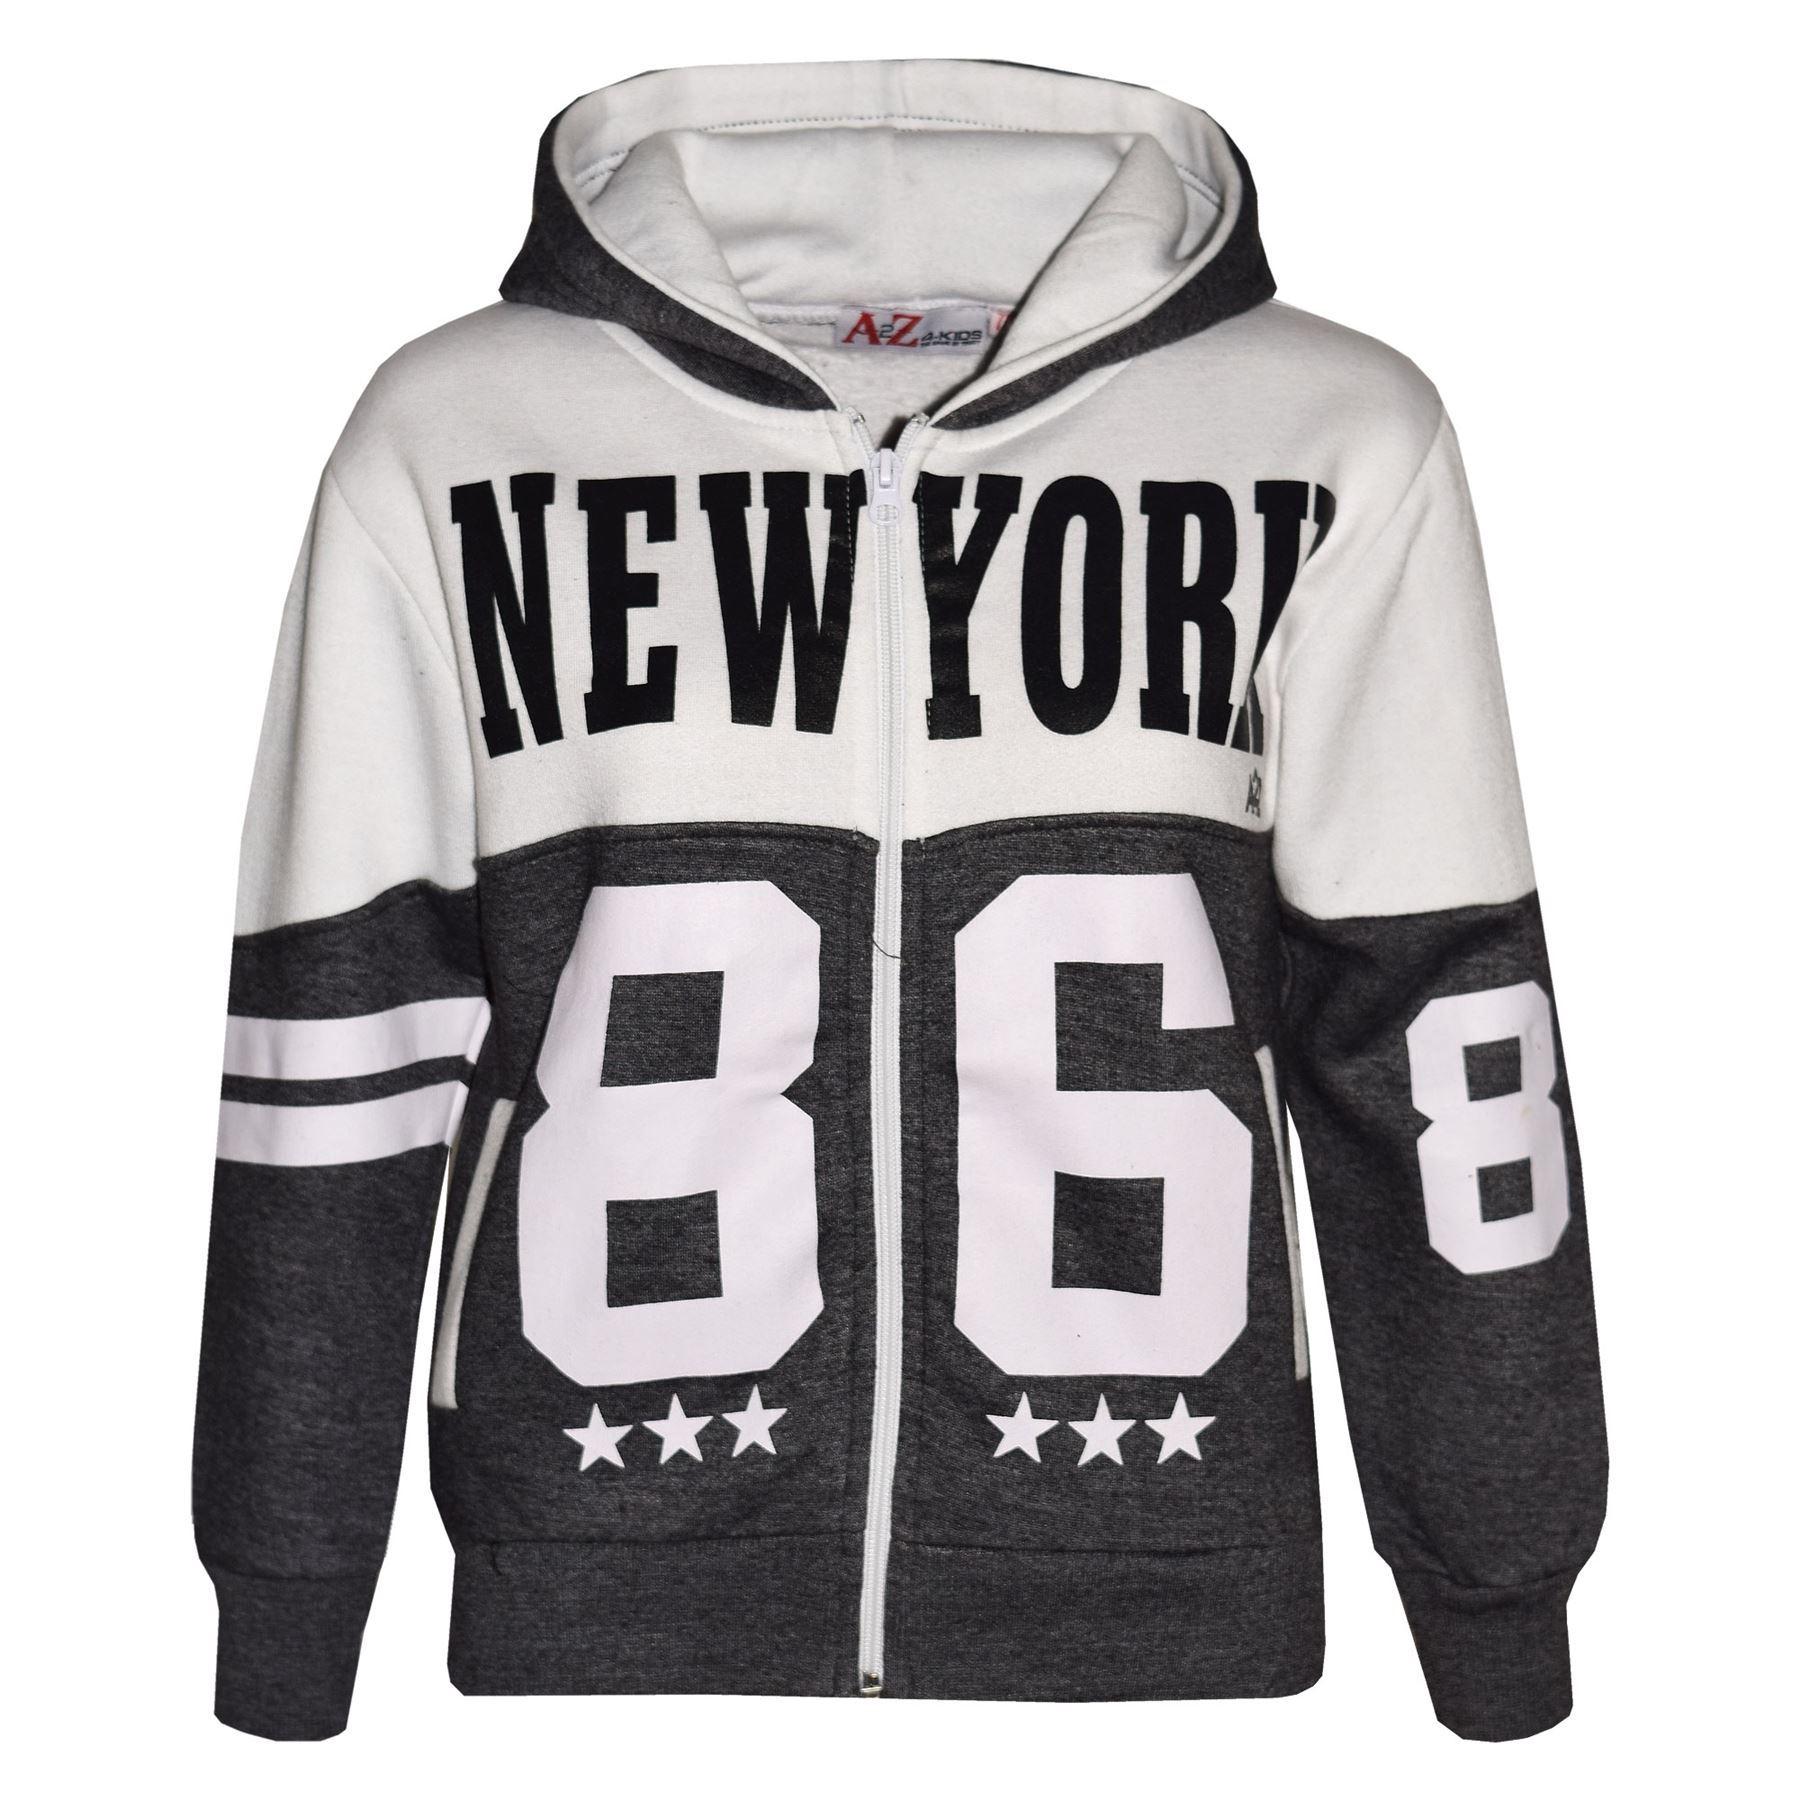 Kids Tracksuit Boys Girls Designer/'s  New York 86 Print Jogging Suit 7-13 Years